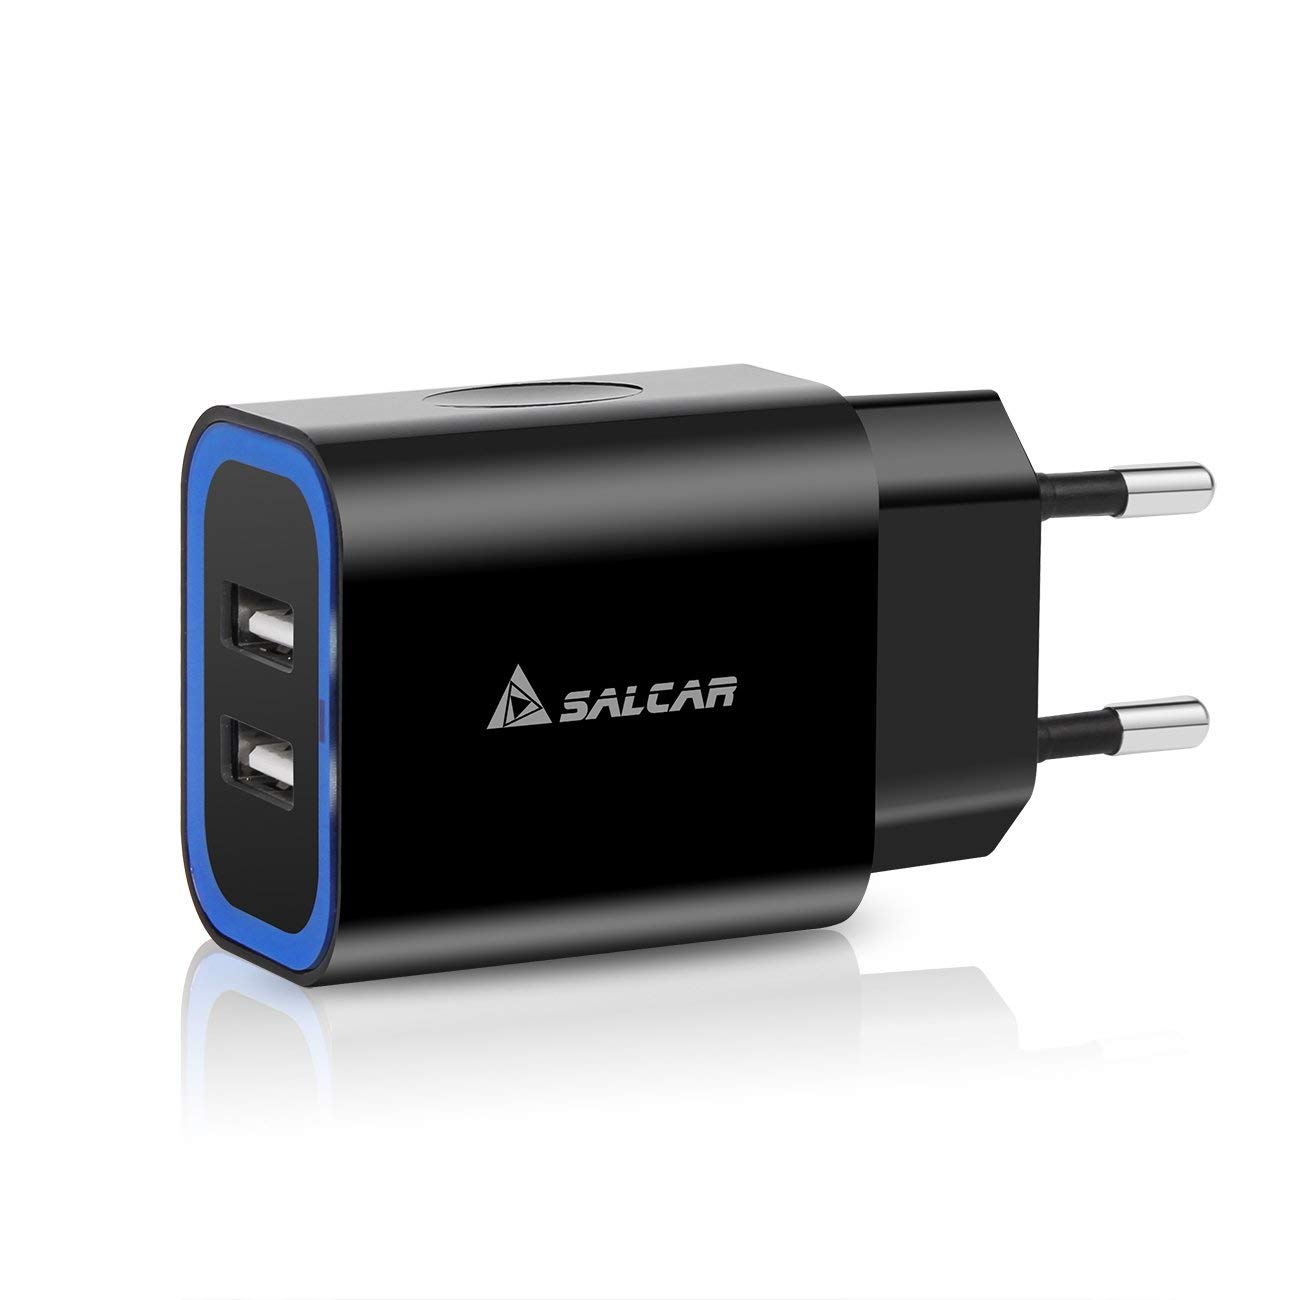 SALCAR 12W Cargador de Pared Coolreall Universal Adaptador de Corriente con 2 Puertos USB 5V 2,4A para iPhone 7 / 7 Plus, iPad Air 2 / mini 3, Samsung ...